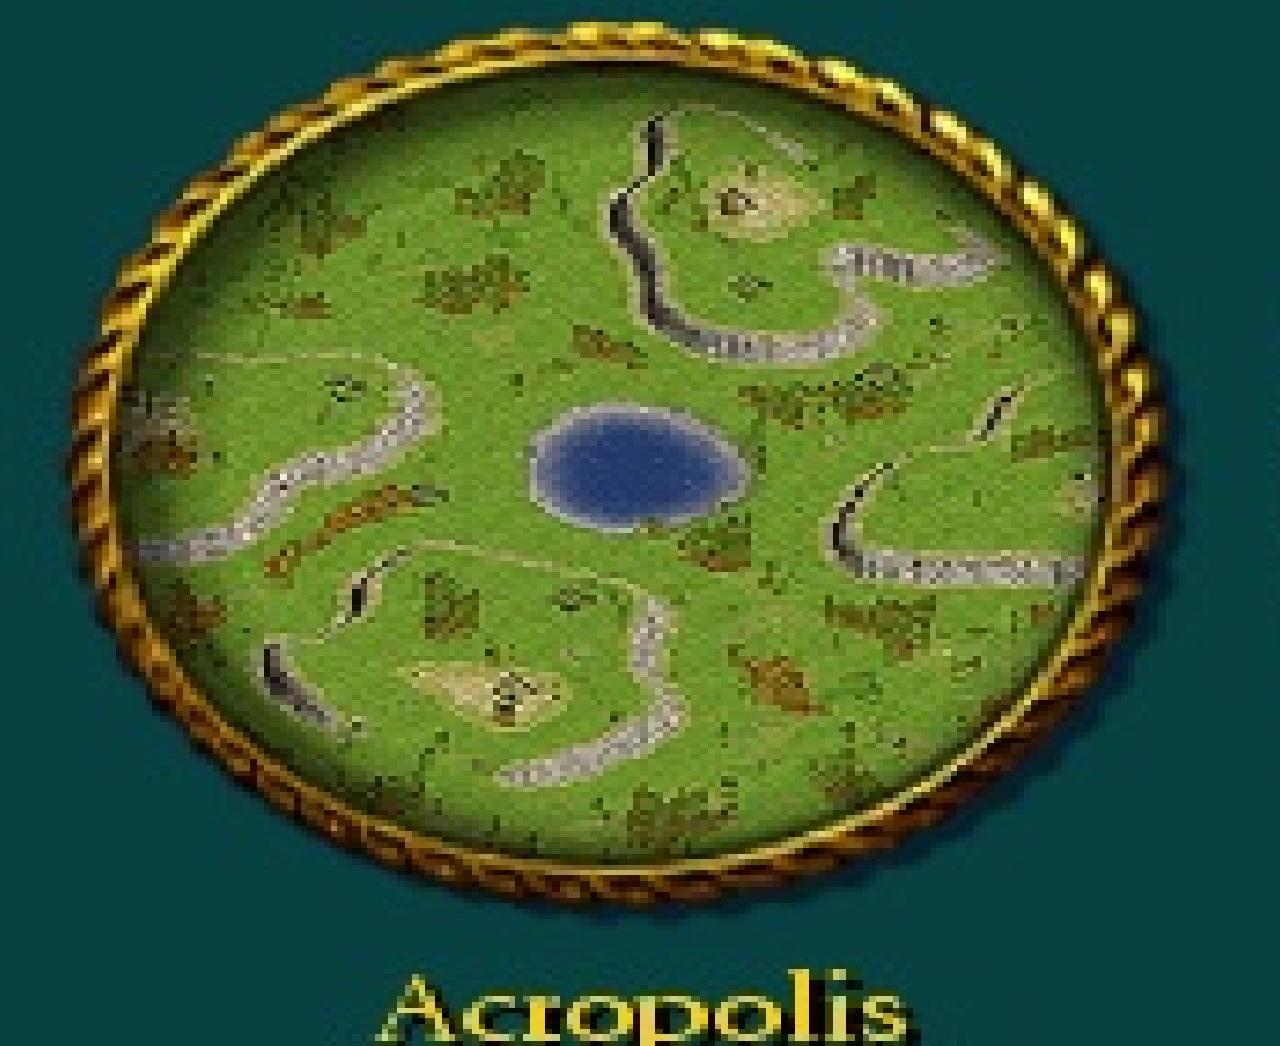 Acropolis (map)